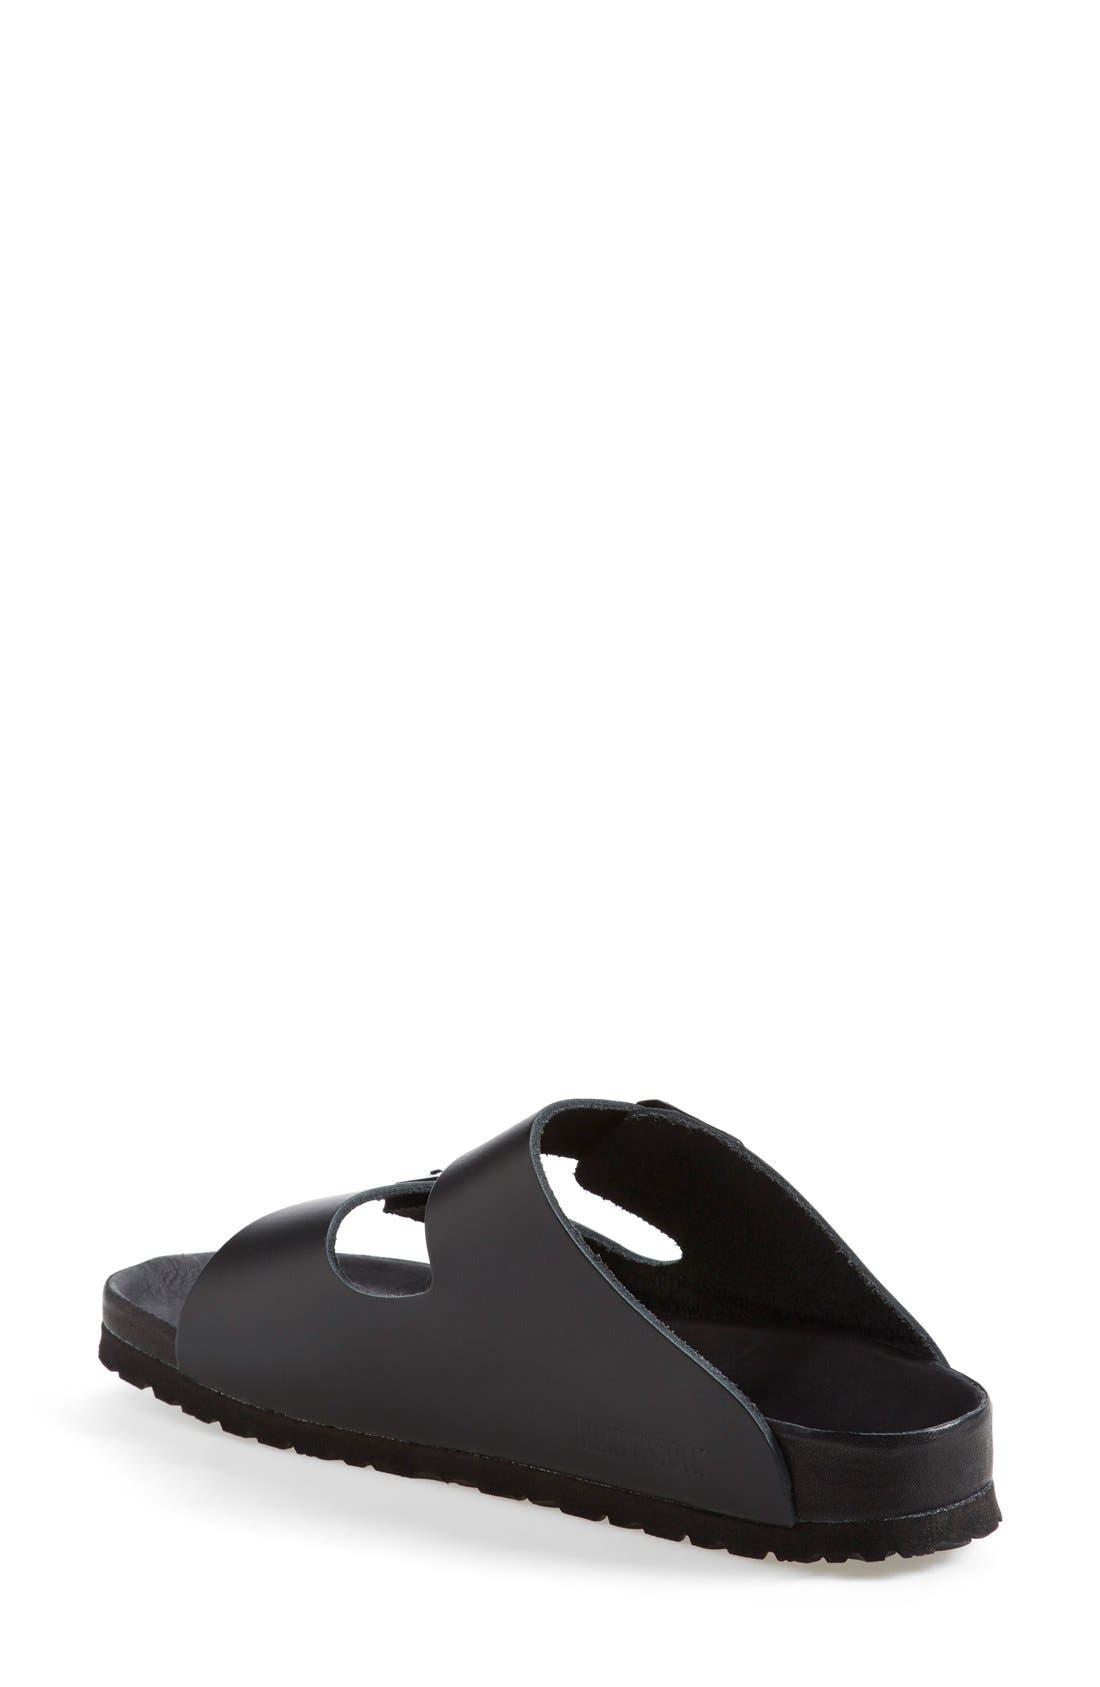 'Monterey' Leather Sandal,                             Alternate thumbnail 4, color,